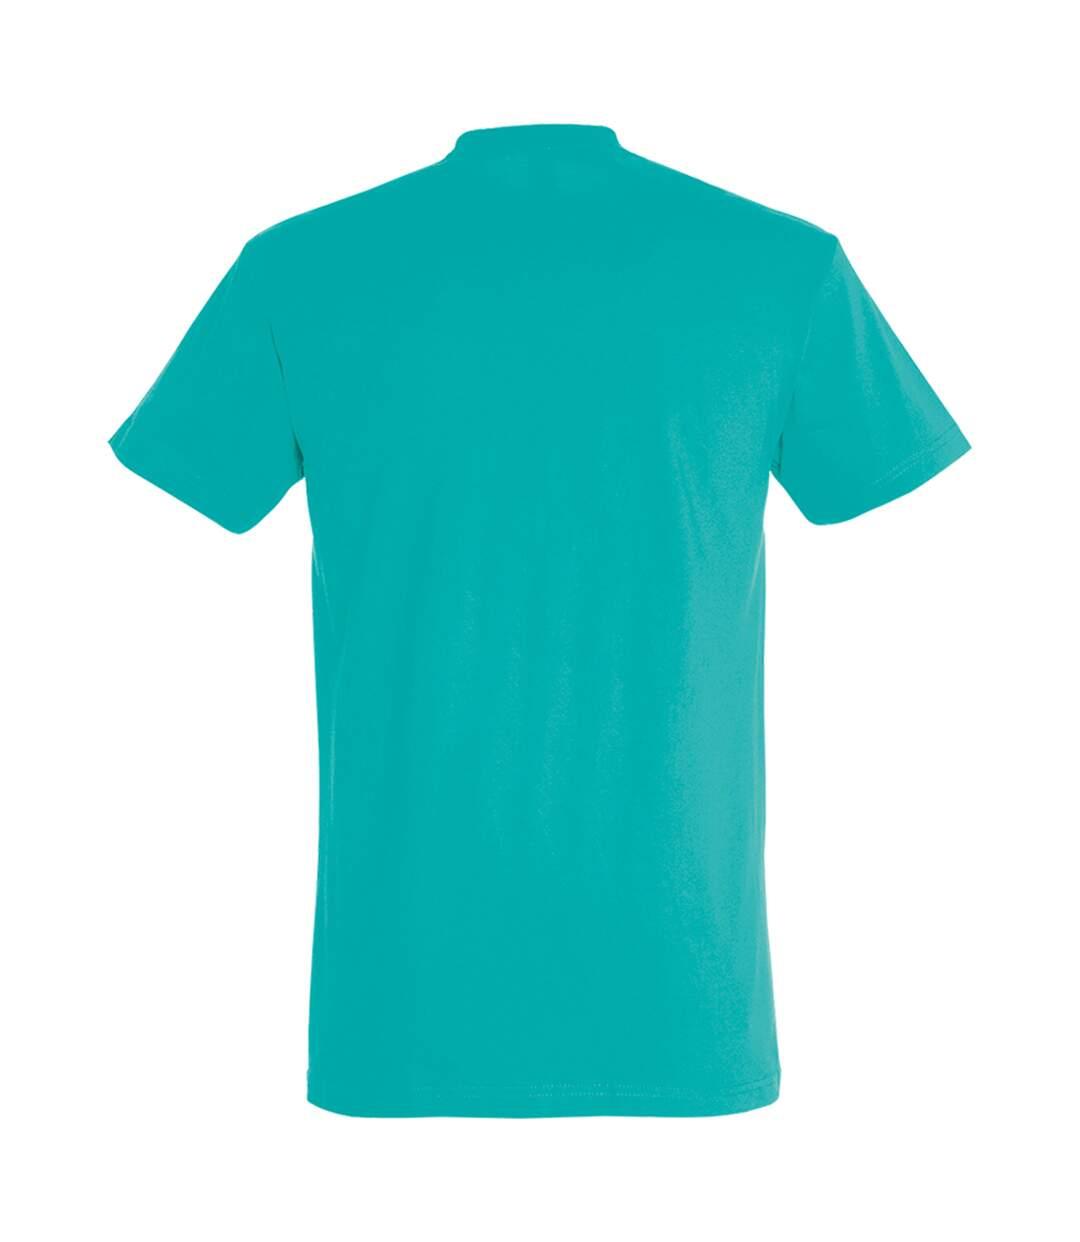 SOLS Mens Imperial Heavyweight Short Sleeve T-Shirt (Caribbean Blue) - UTPC290